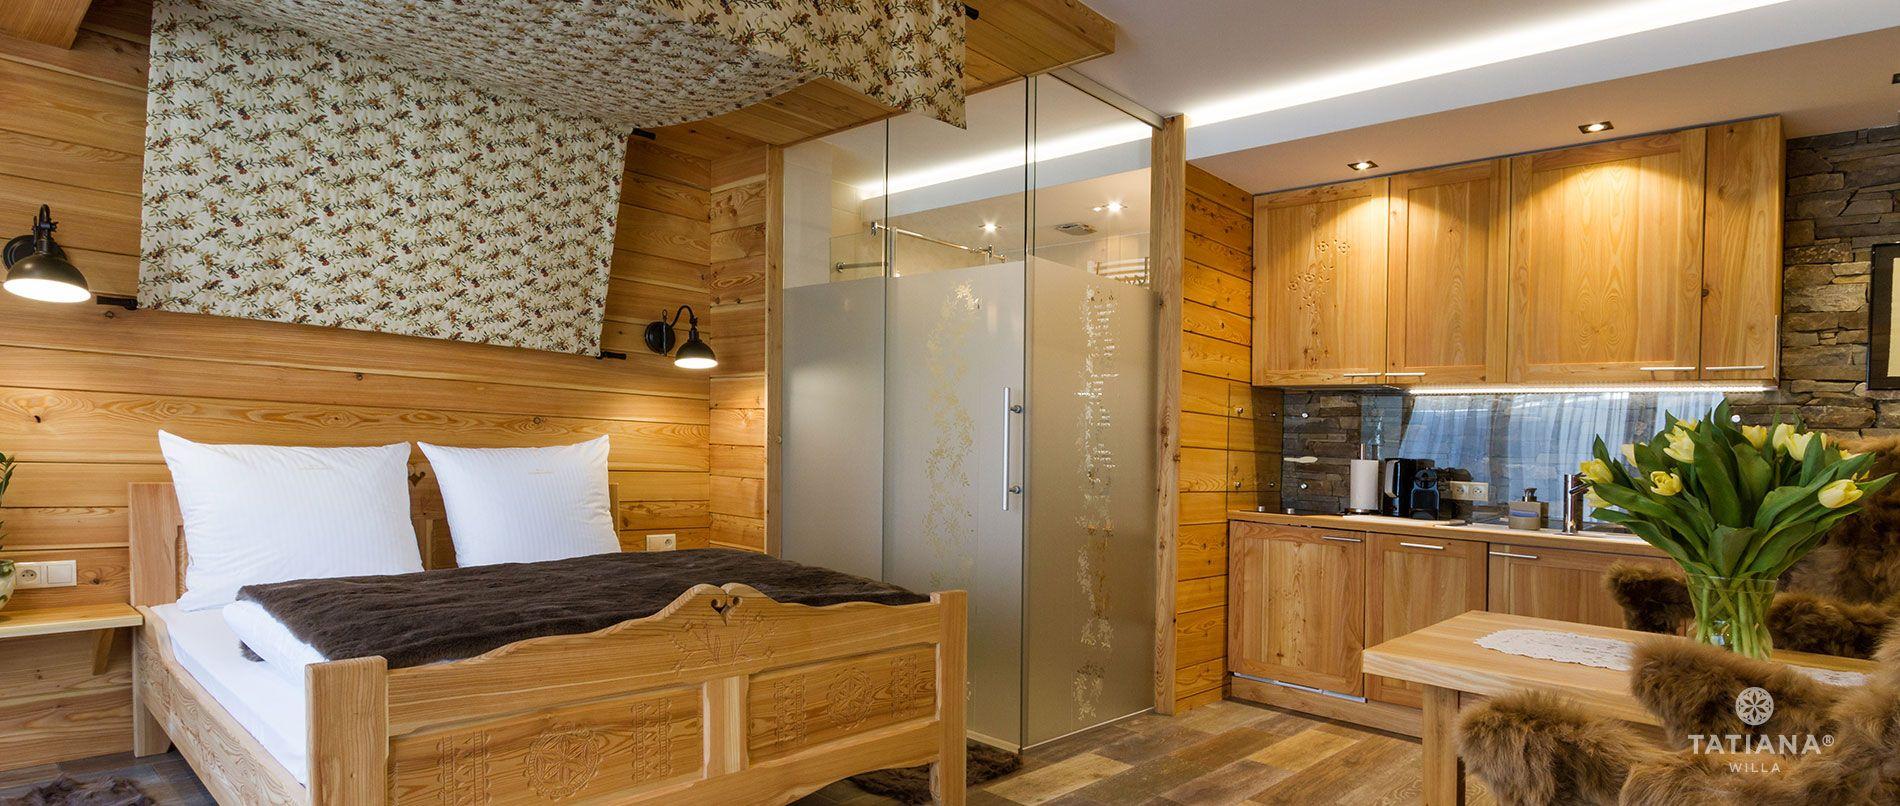 Larch Apartment - kitchenette, leisure/sleeping part